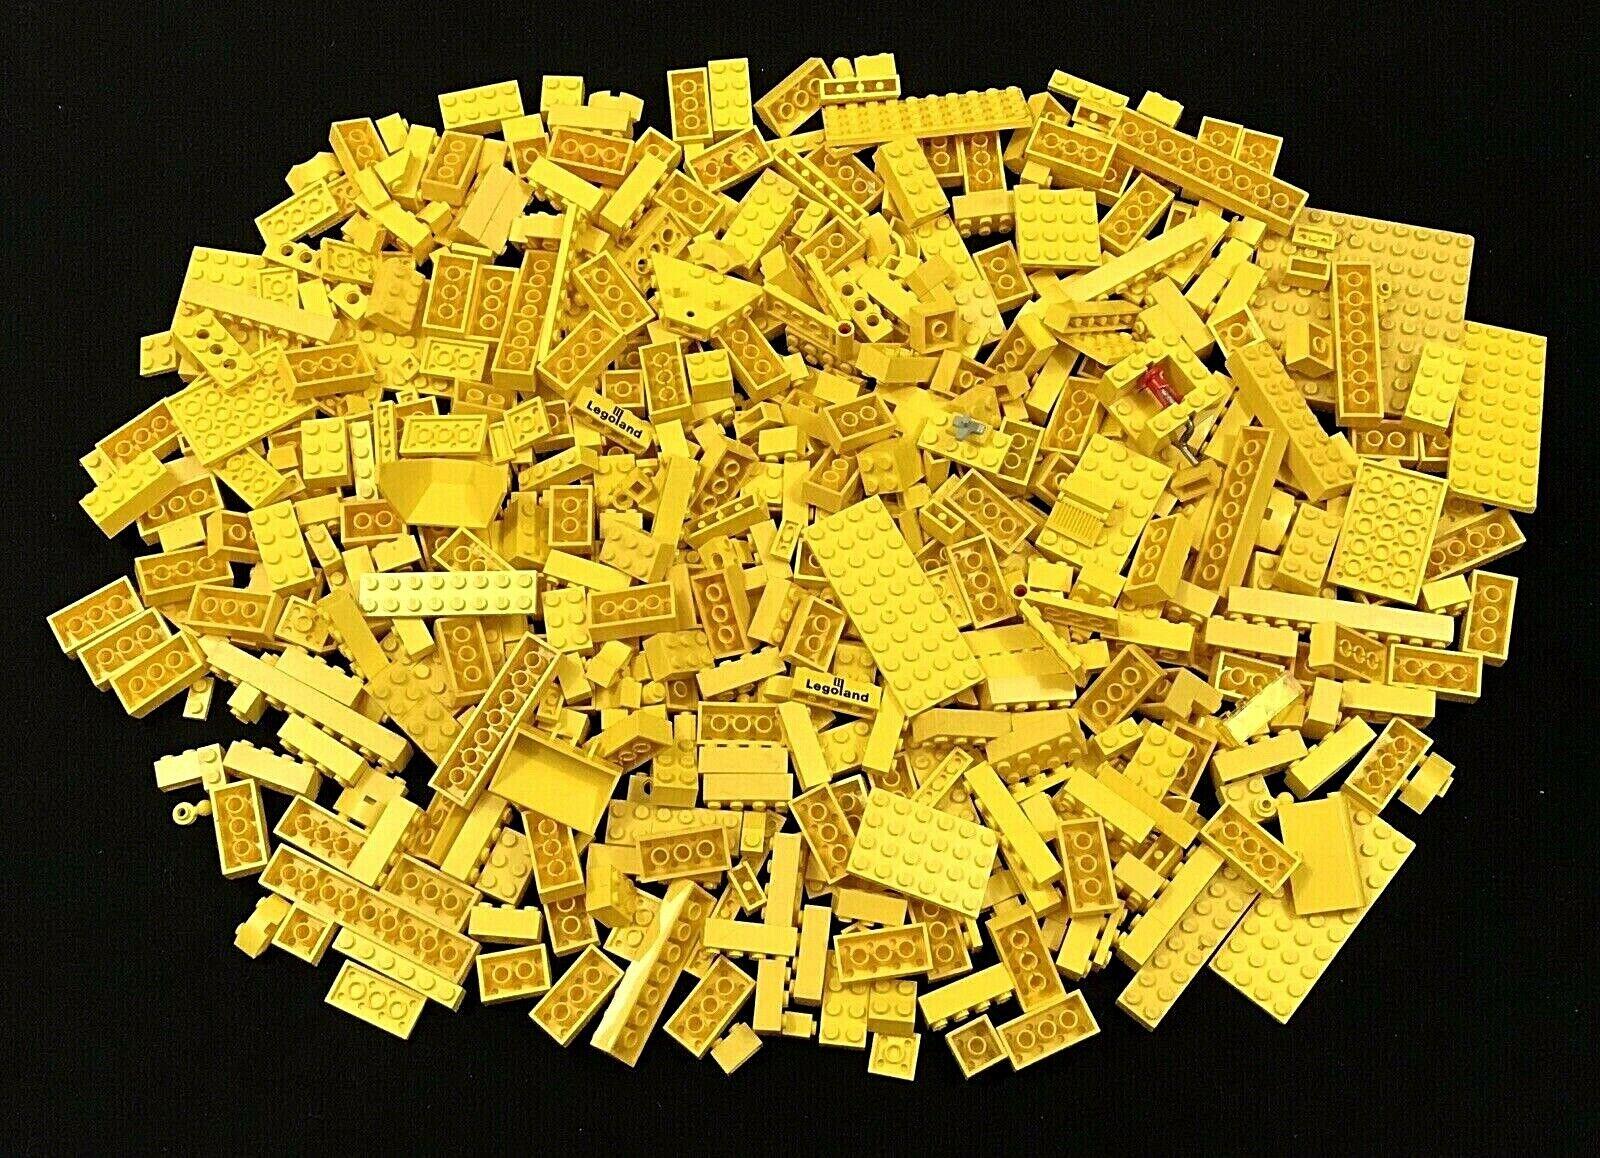 LEGO Gelb BRICKS & PIECES - 2+ POUNDS - VINTAGE & NEW - BULK ASSORTSieT LOT